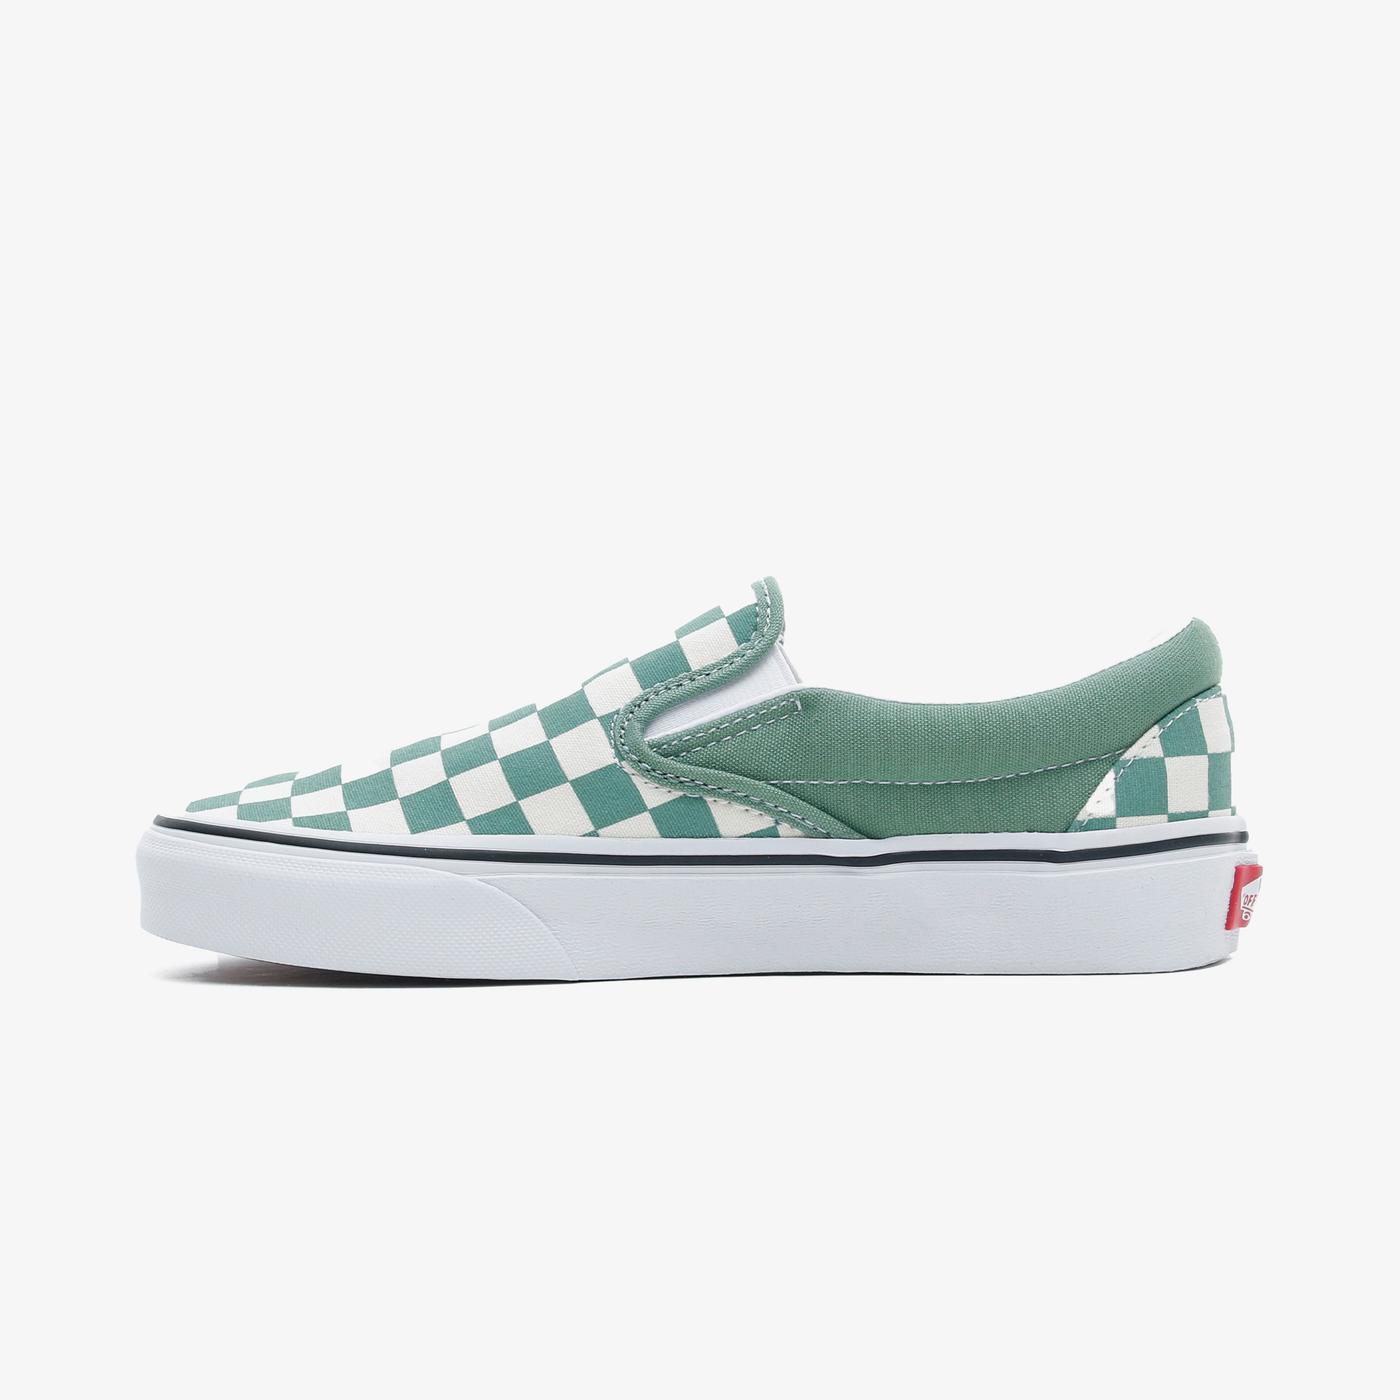 Vans Classic Slip-On Checkerboard Kadın Yeşil Sneaker